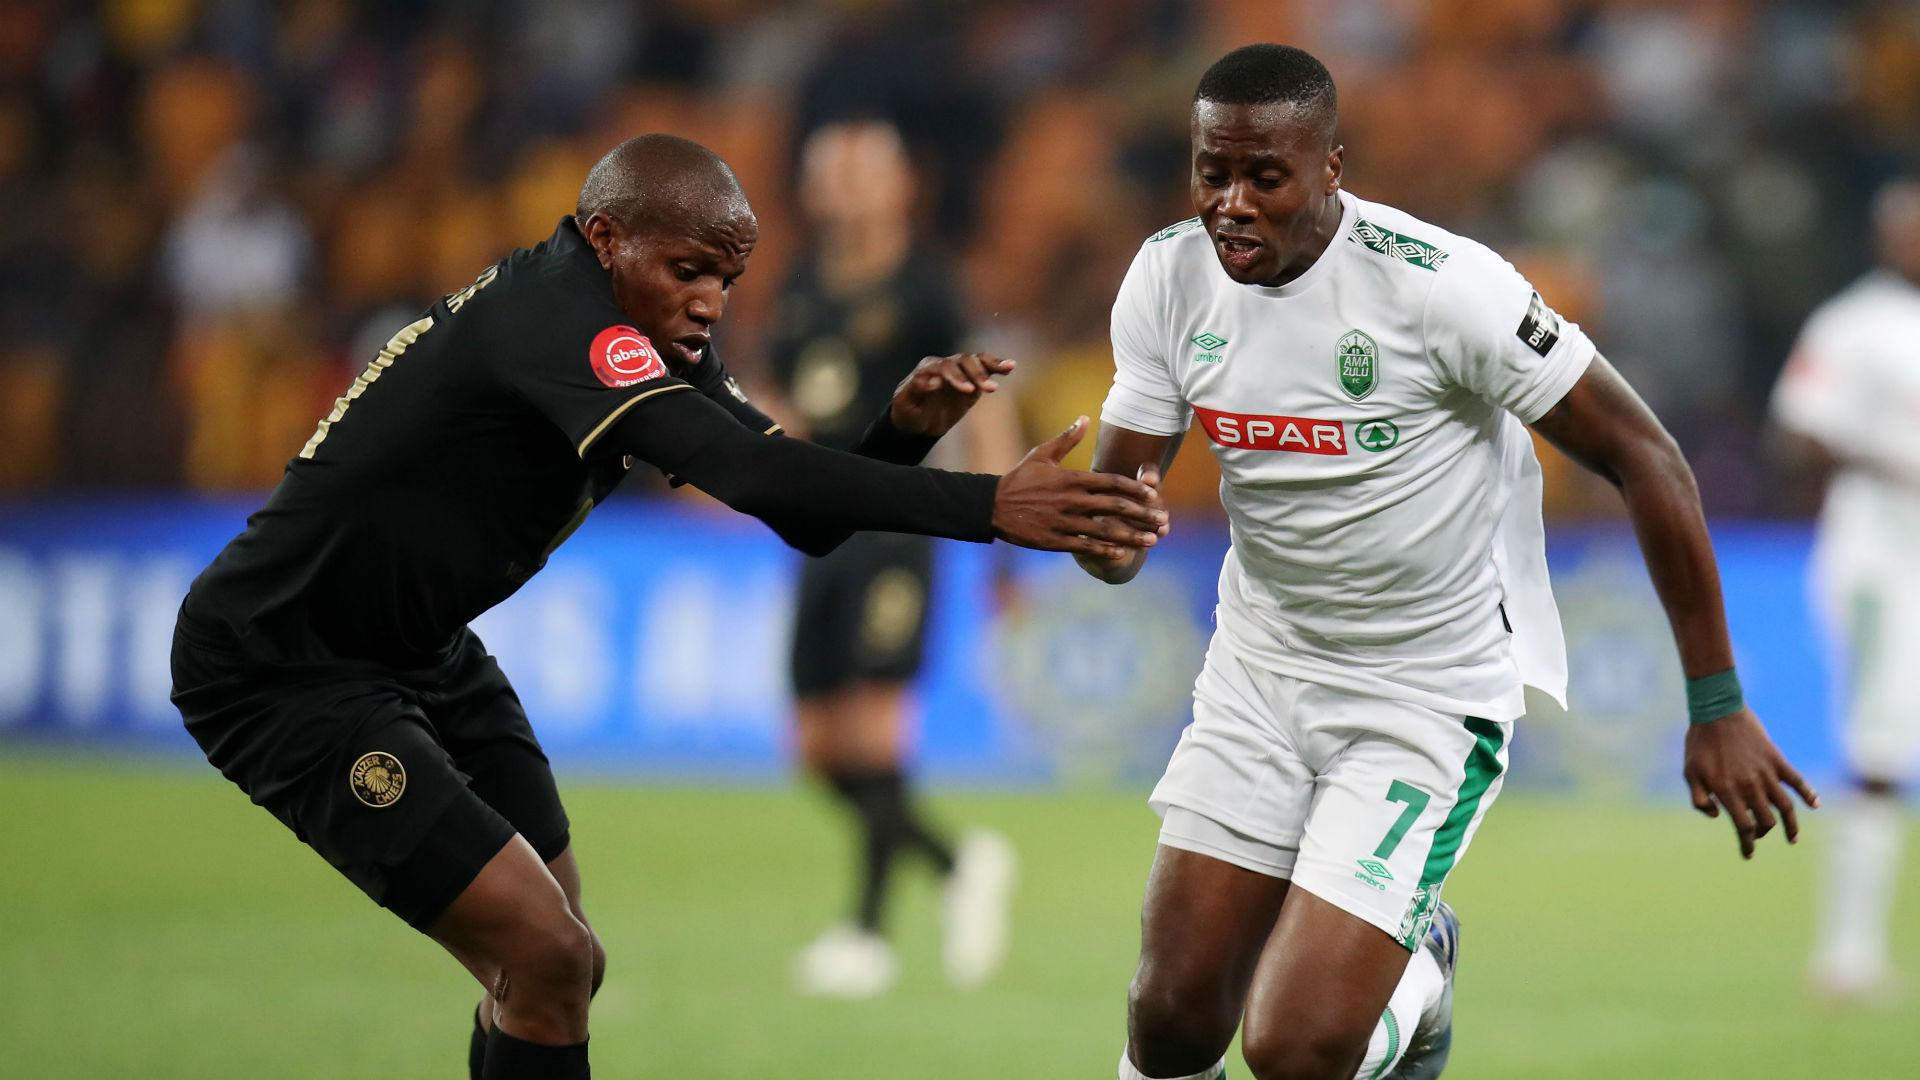 'They helped me perfect my finishing'- AmaZulu's Ntuli credits Nomvethe and Khenyeza for scoring form